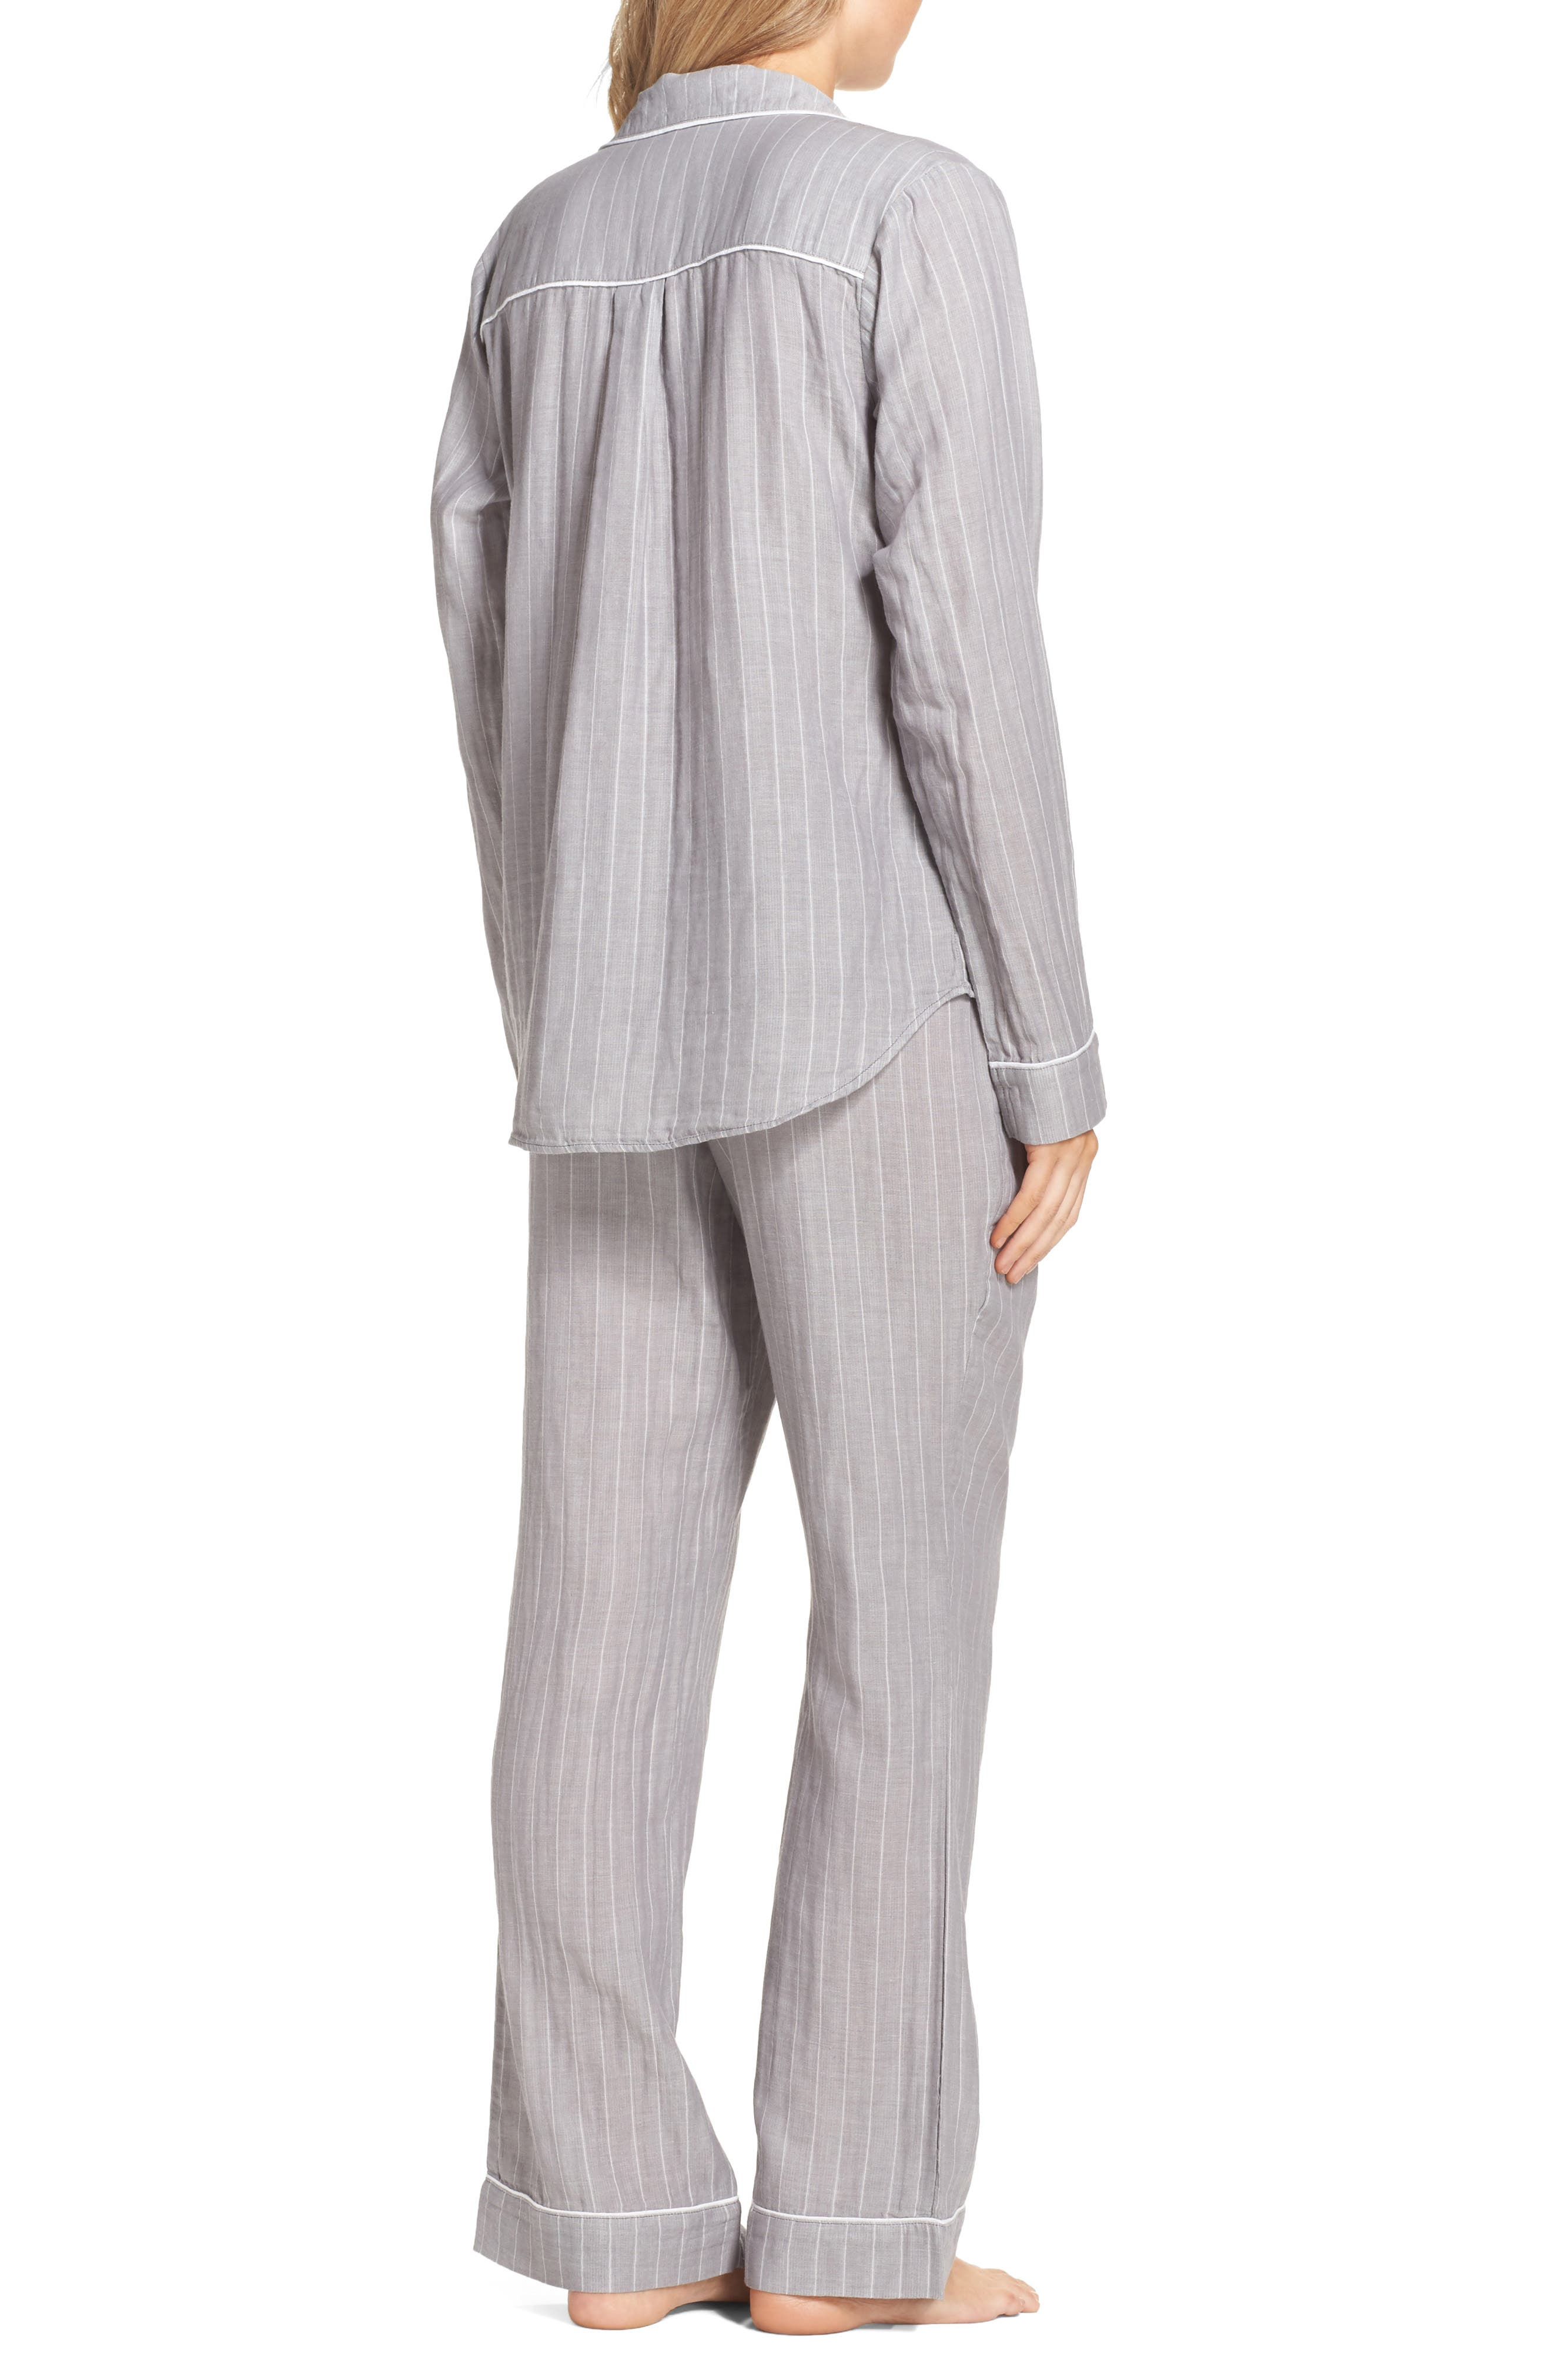 Raven Stripe Pajamas,                             Alternate thumbnail 2, color,                             020